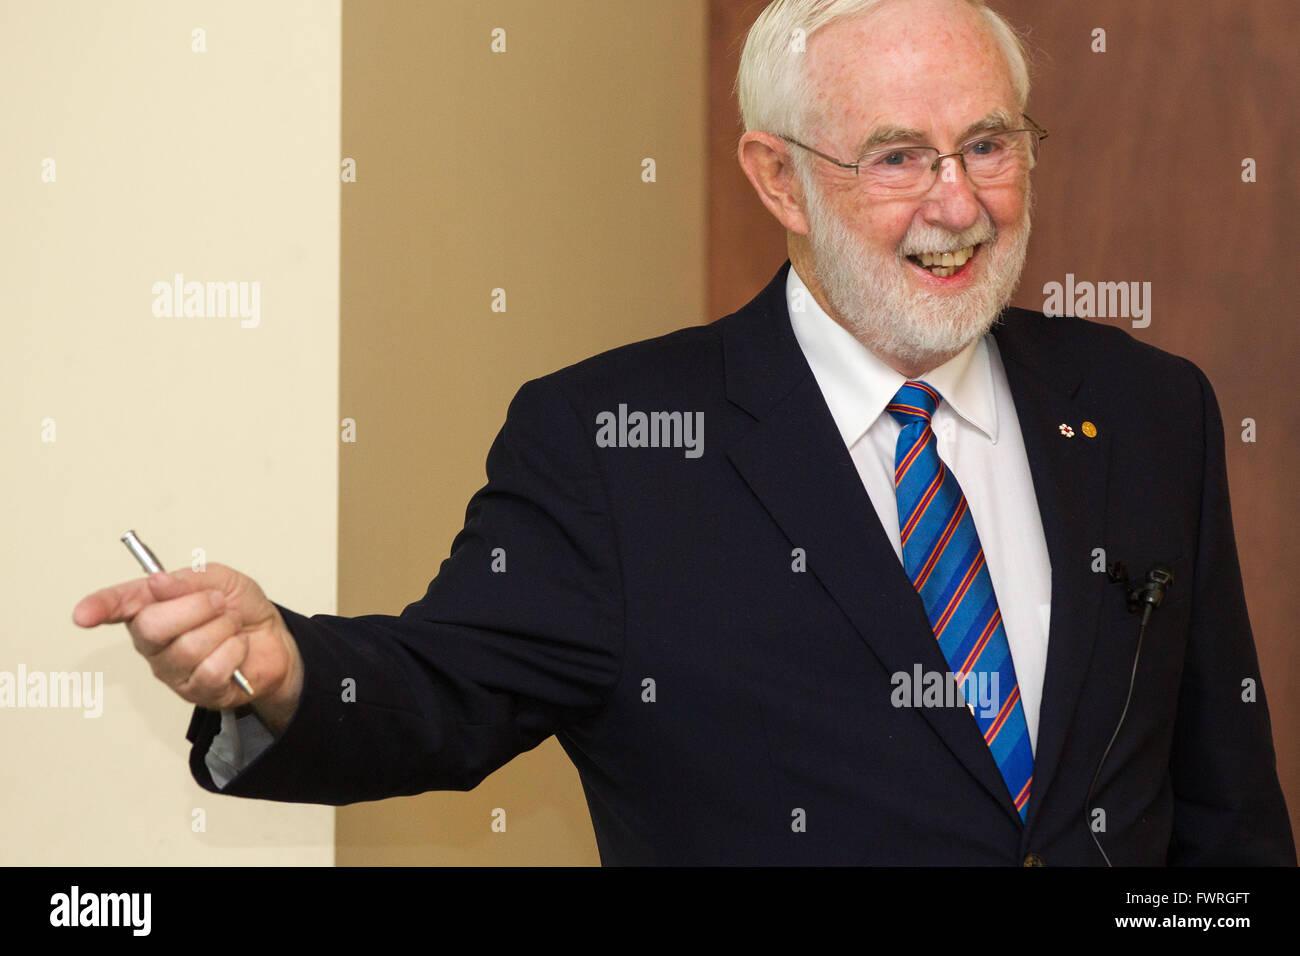 Nobel prize co-winner in physics Arthur McDonald speaks at Queen's University in Kingston, Ont., on March 11, - Stock Image